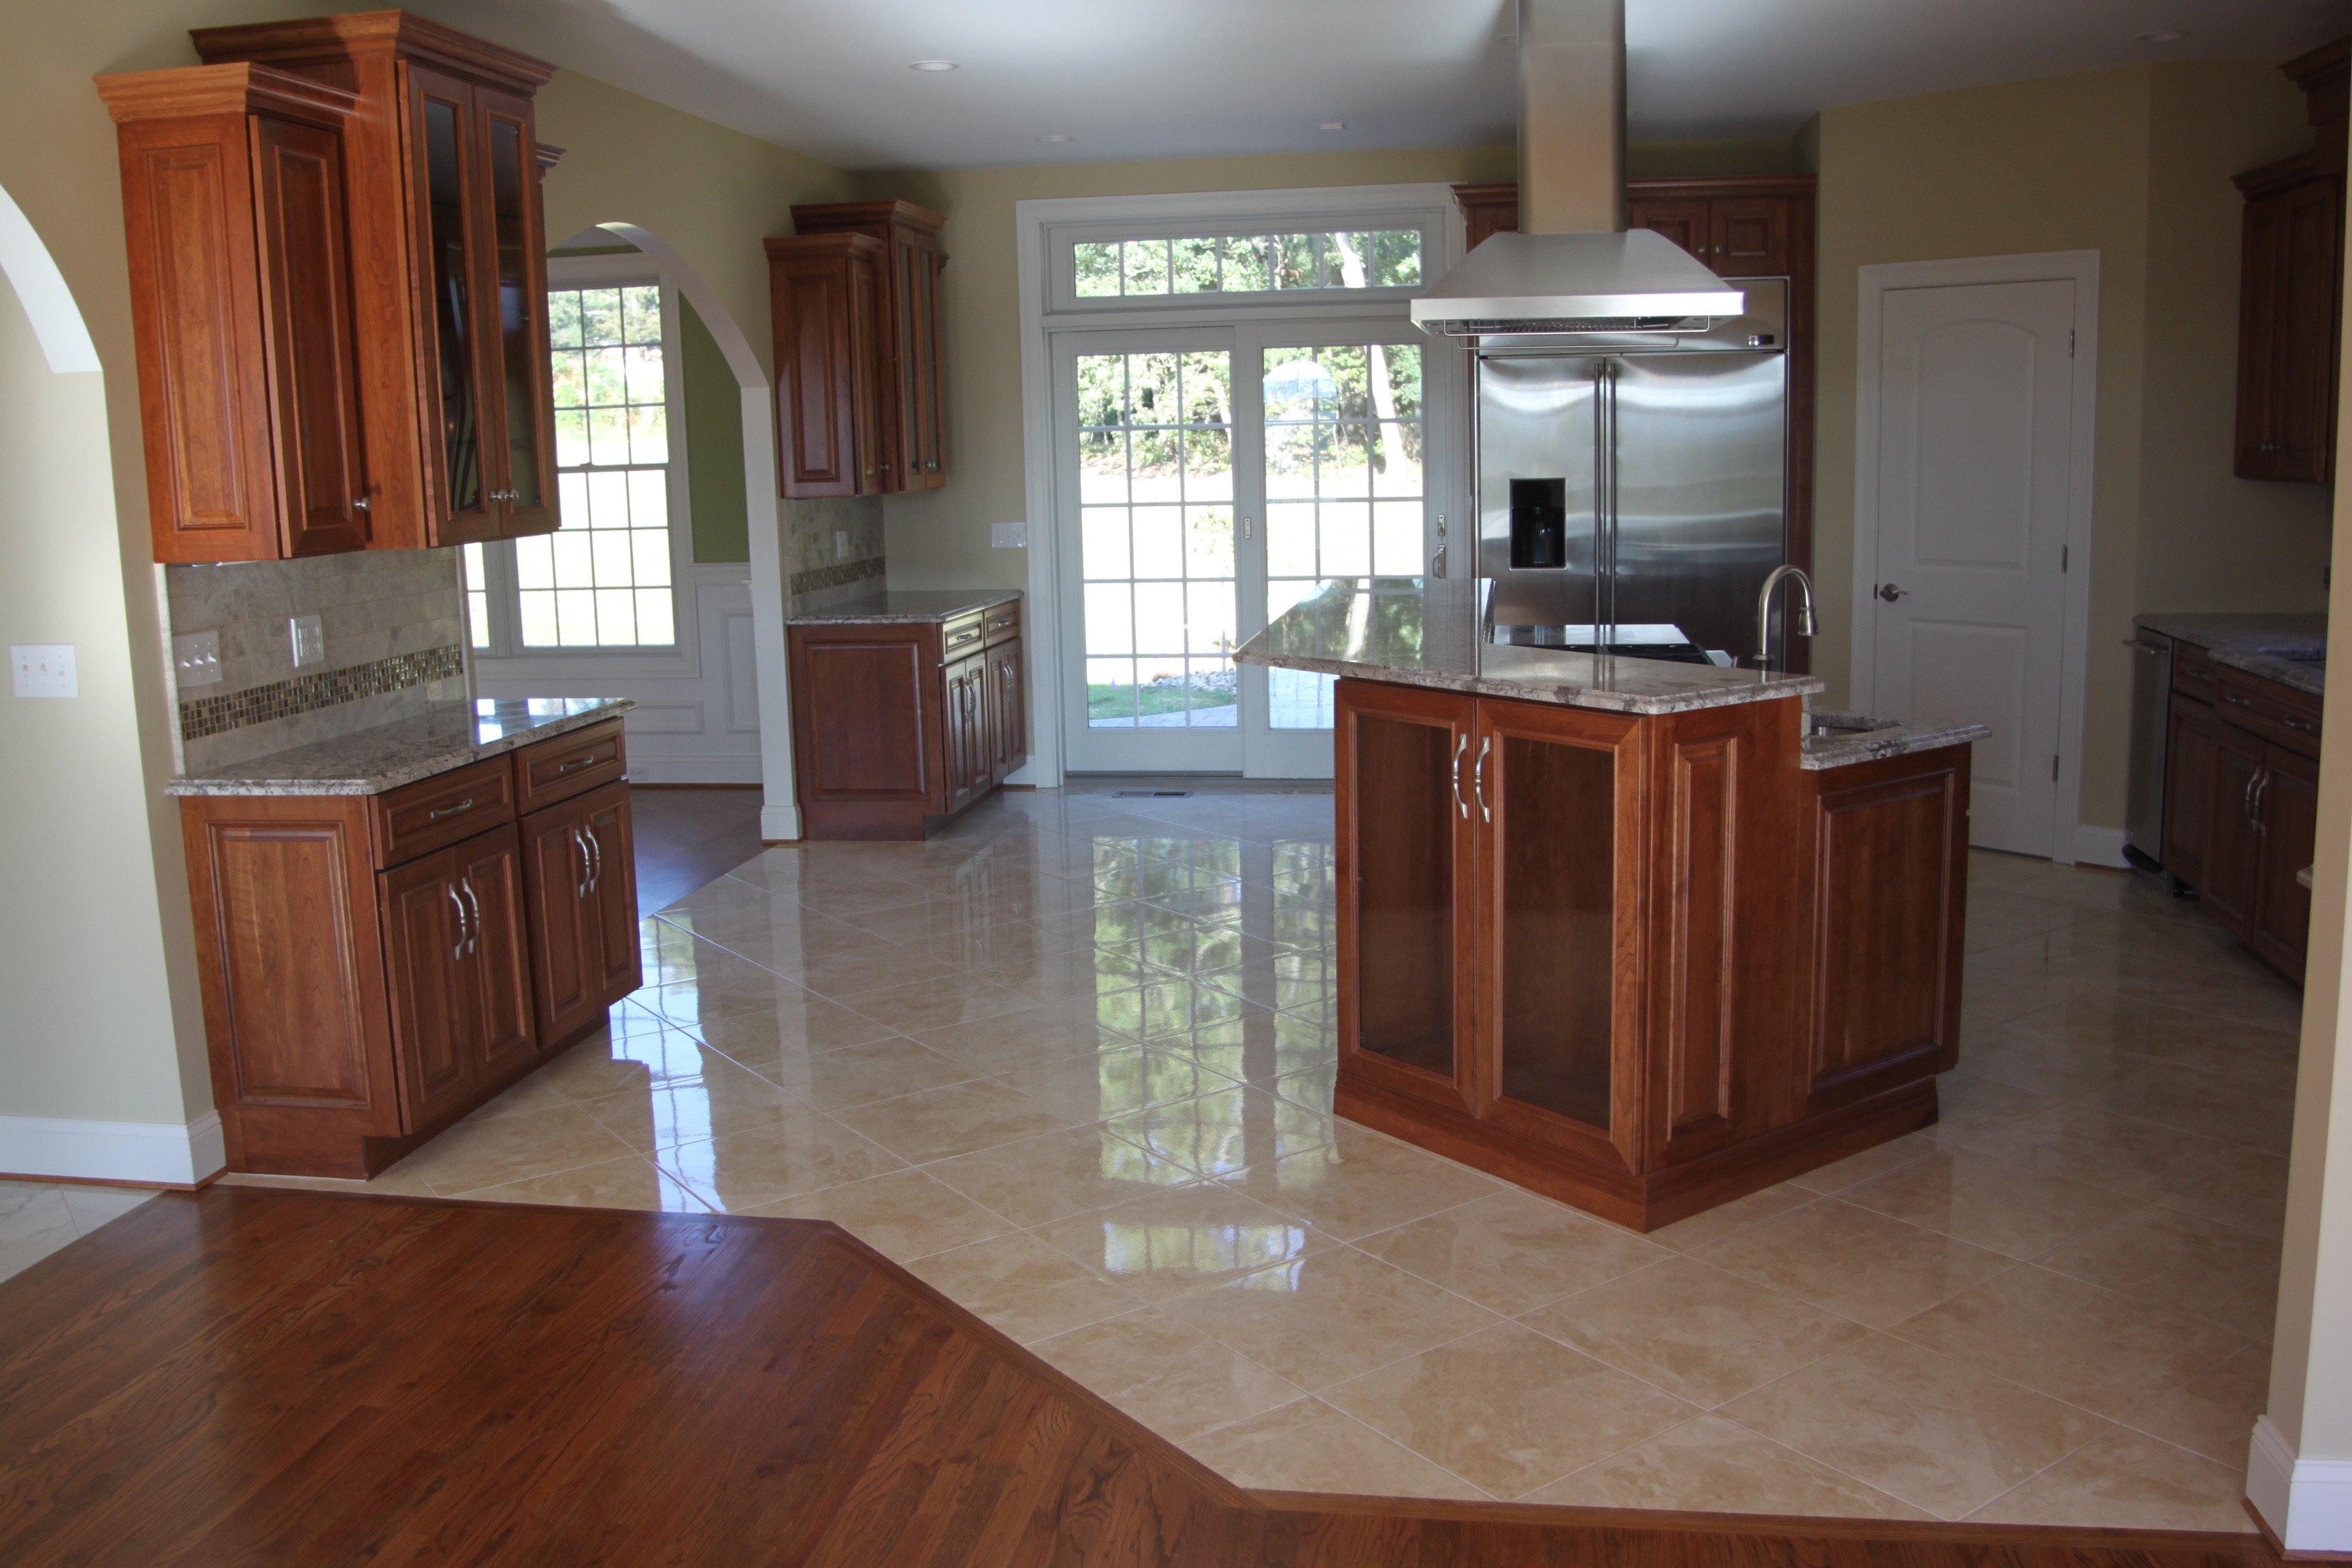 hardwood look laminate flooring of should your flooring match your kitchen cabinets or countertops regarding floor wall tile